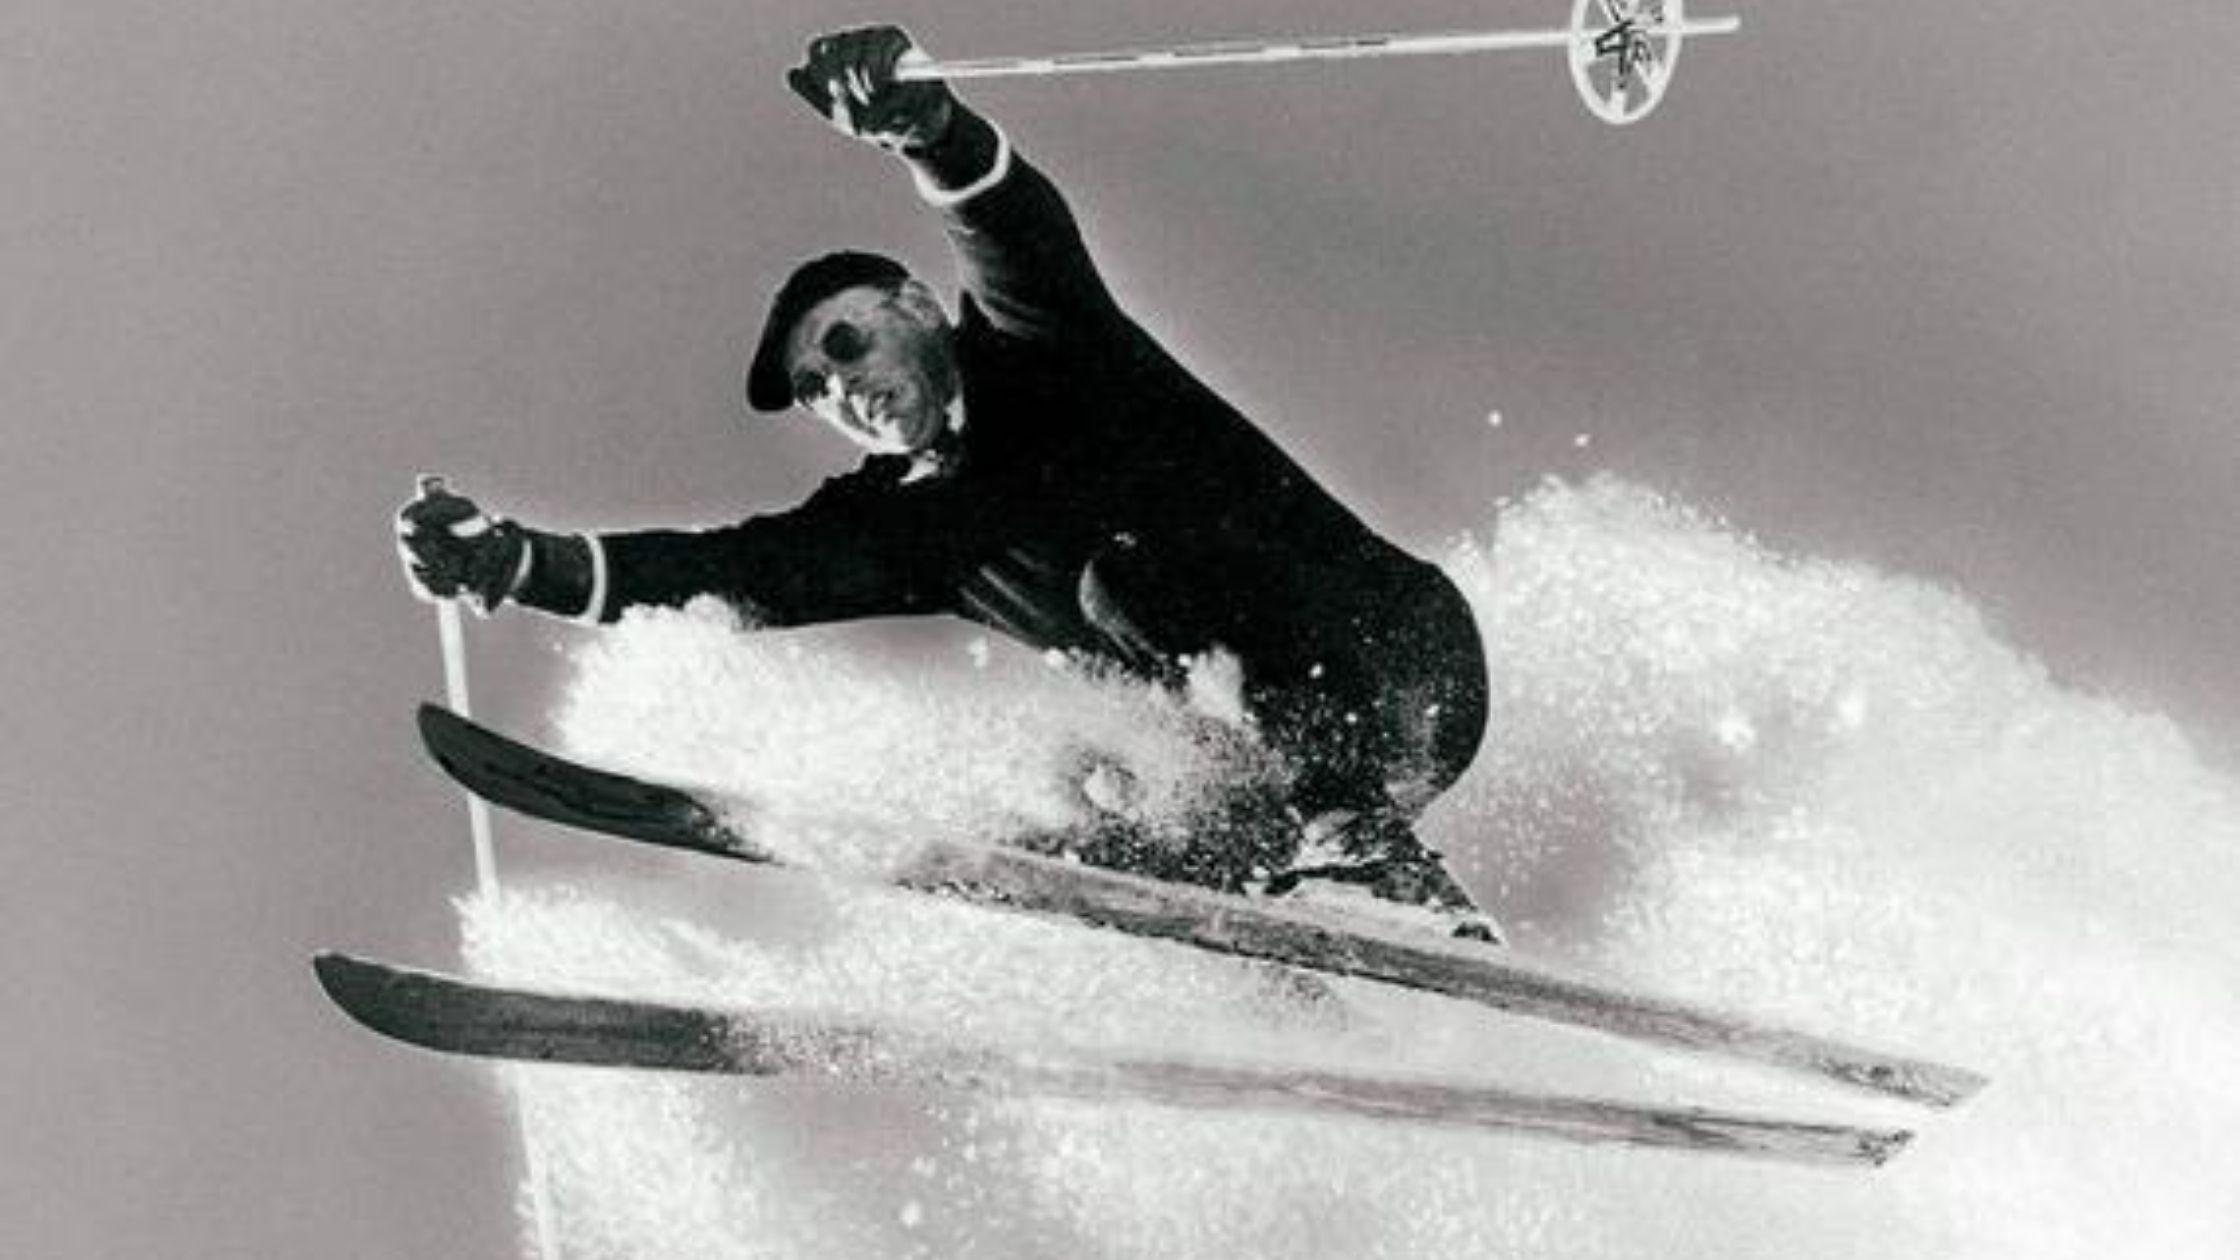 Vintage photo of a man skiing in Mill Ridge neighborhood, former ski resort community.